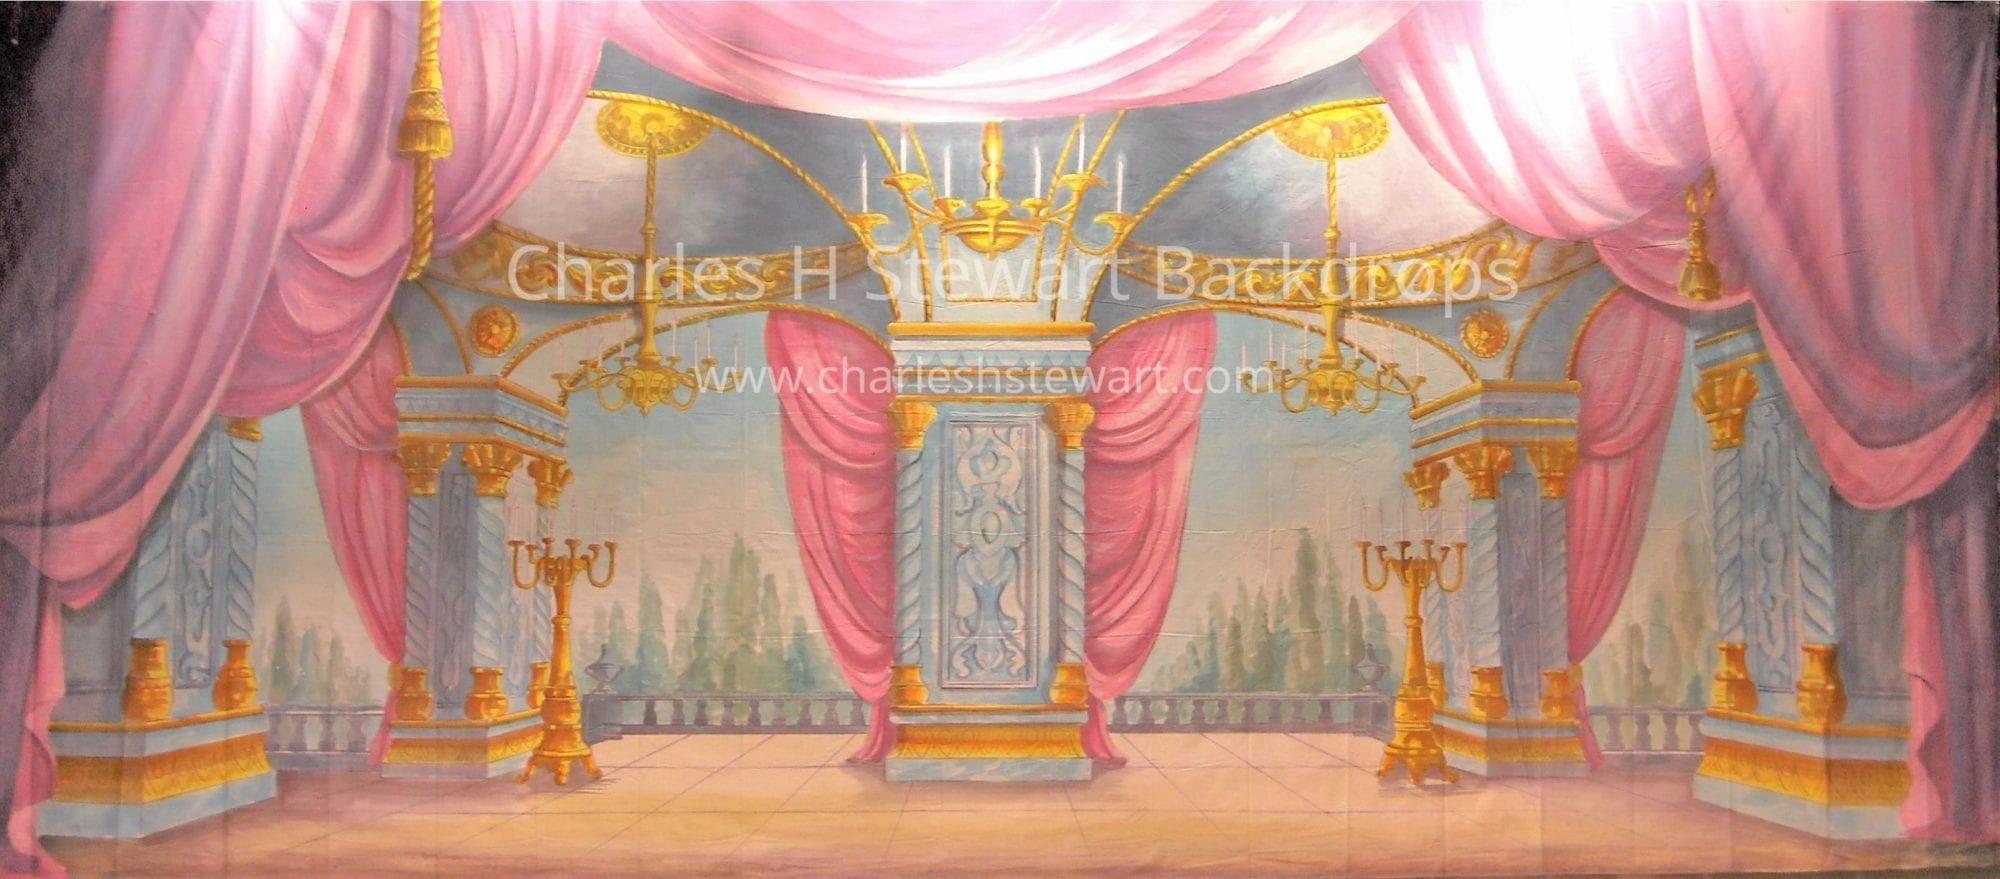 Palace Interior Backdrop Backdrops By Charles H Stewart